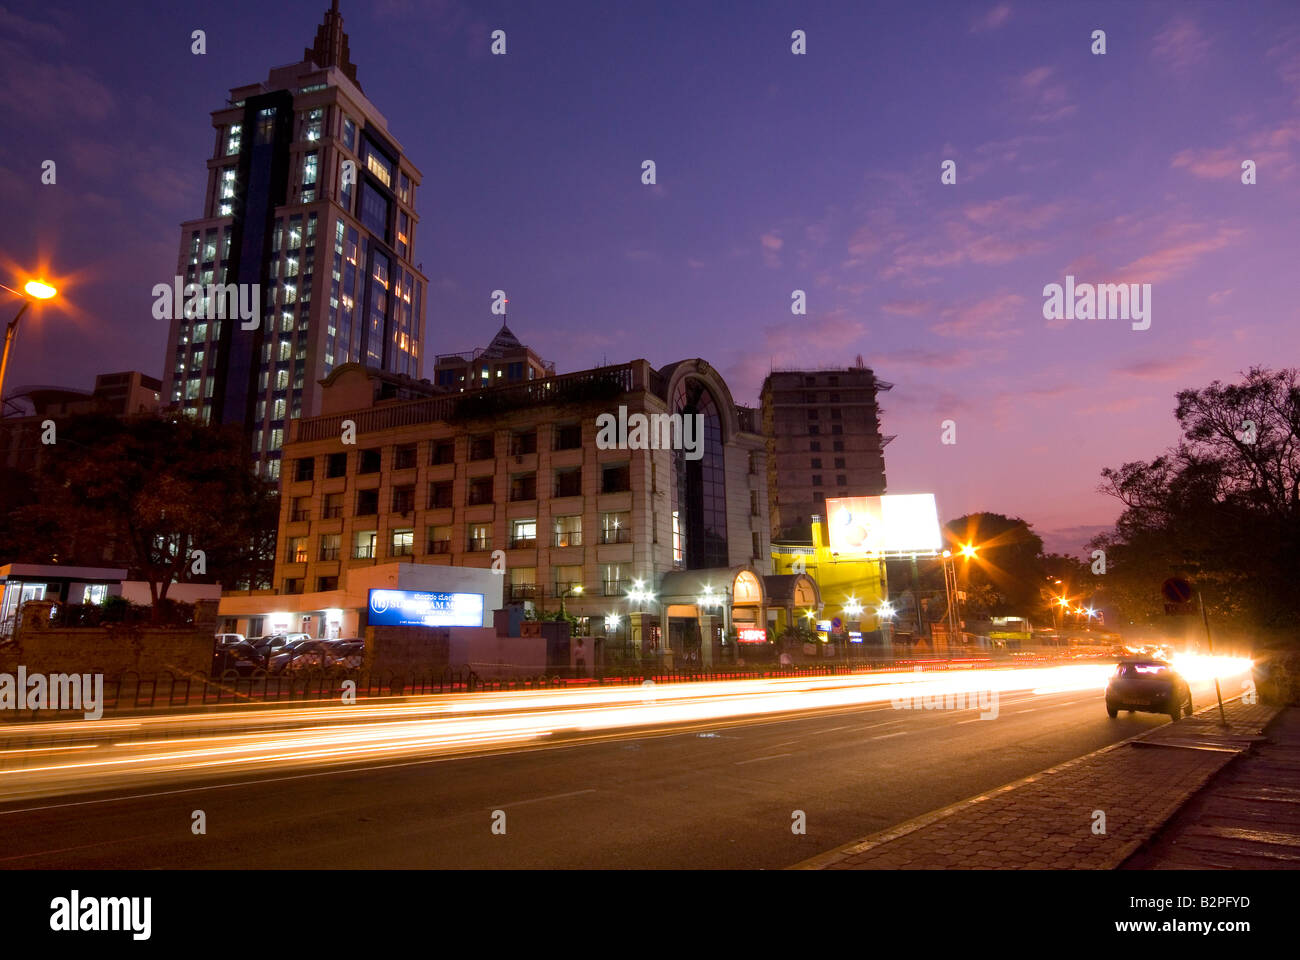 MG Road Area, Shanthala Nagar, Bengaluru (Bangalore), South Karnataka, India - Stock Image